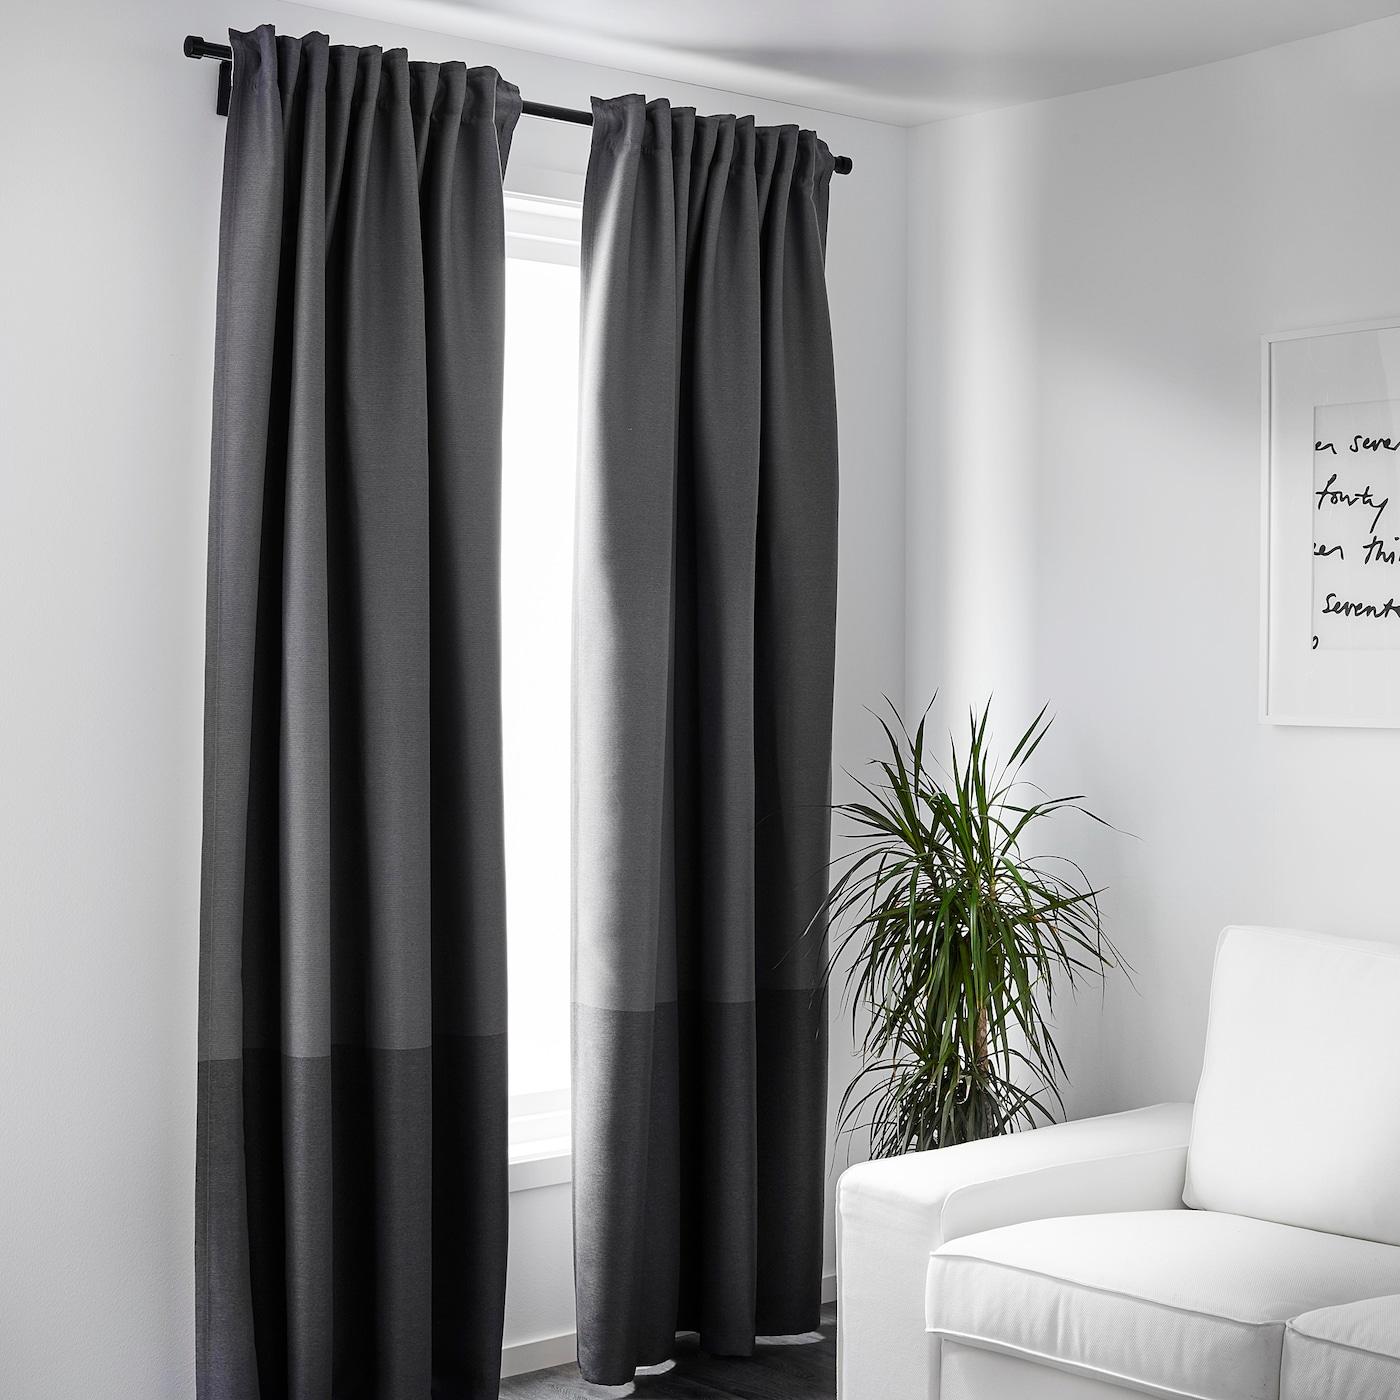 Marjun Blackout Curtains 1 Pair Gray 57x98 Ikea